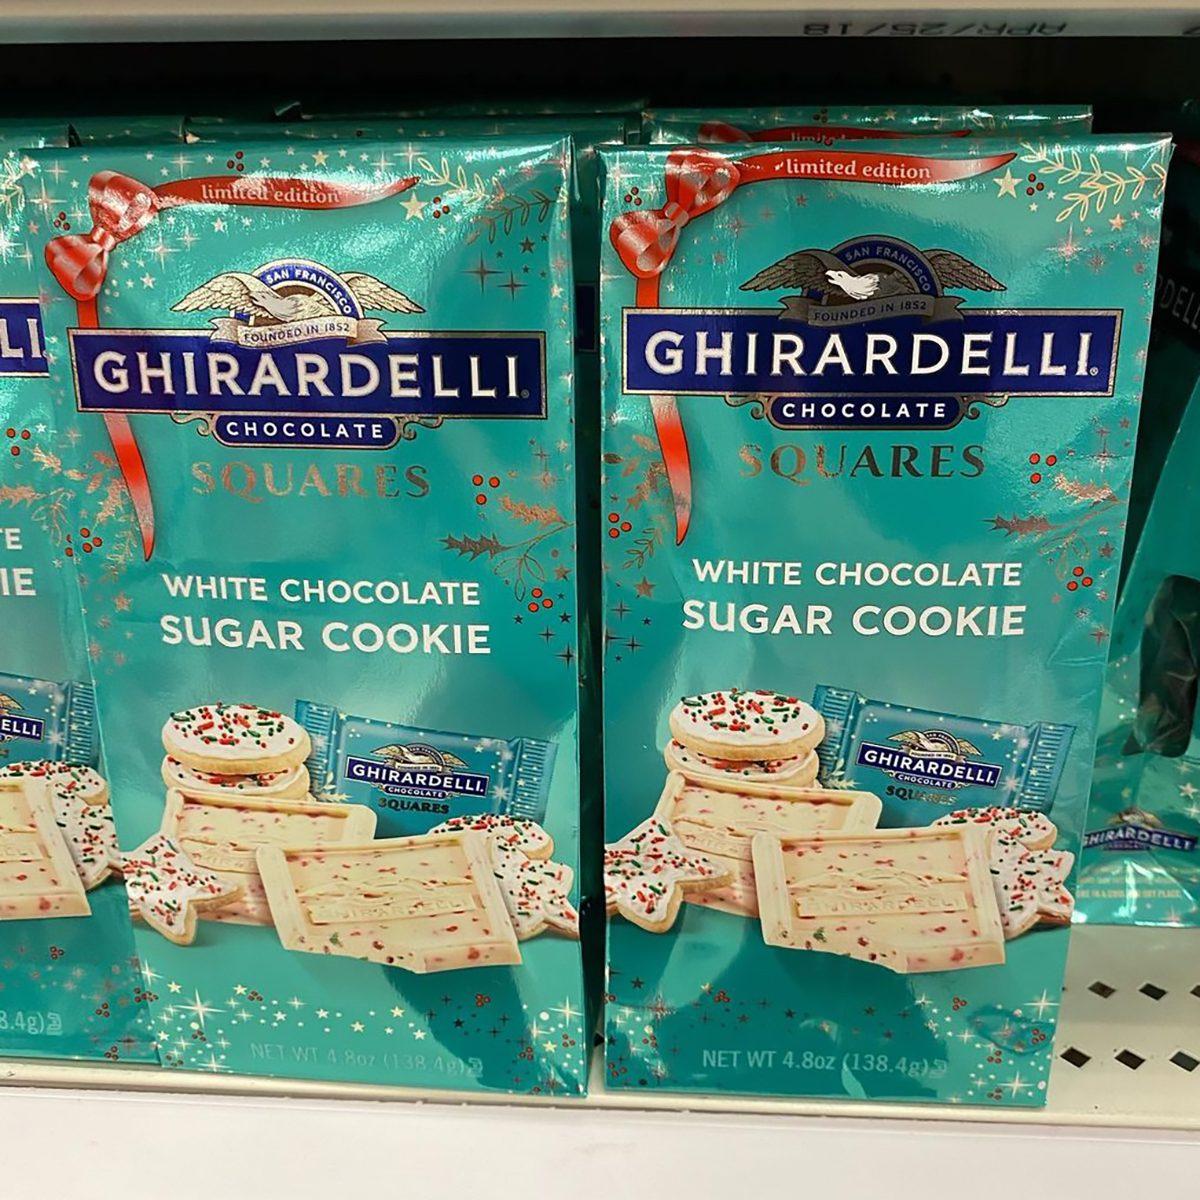 Ghirardelli white chocolate sugar cookie squares